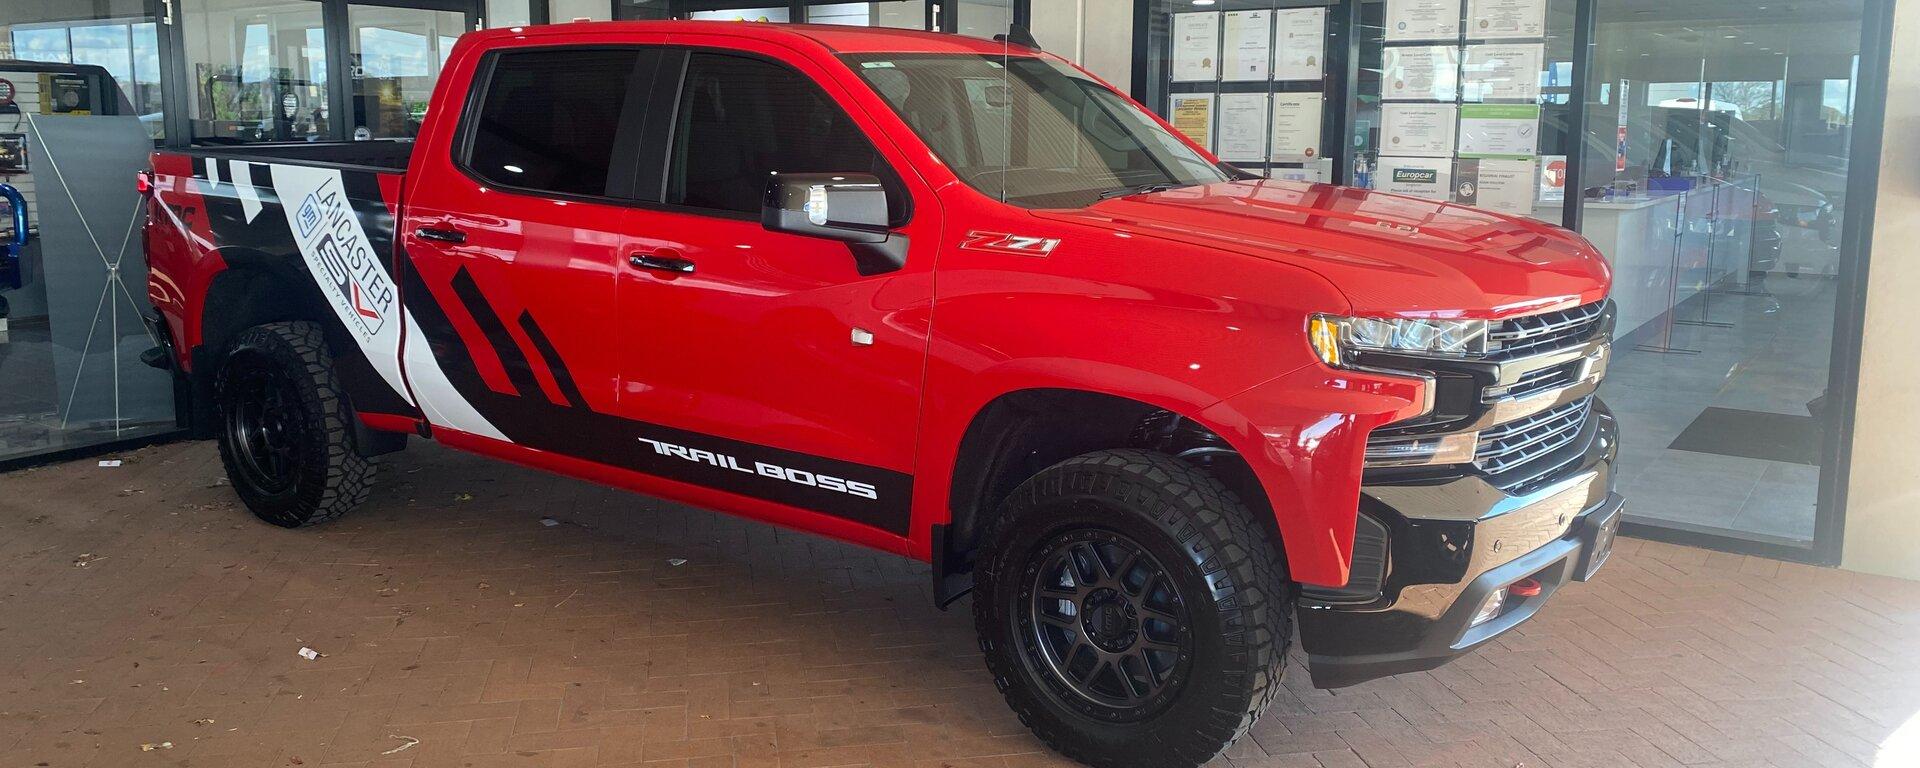 Will Brown's new Silverado 1500 LT TrailBoss